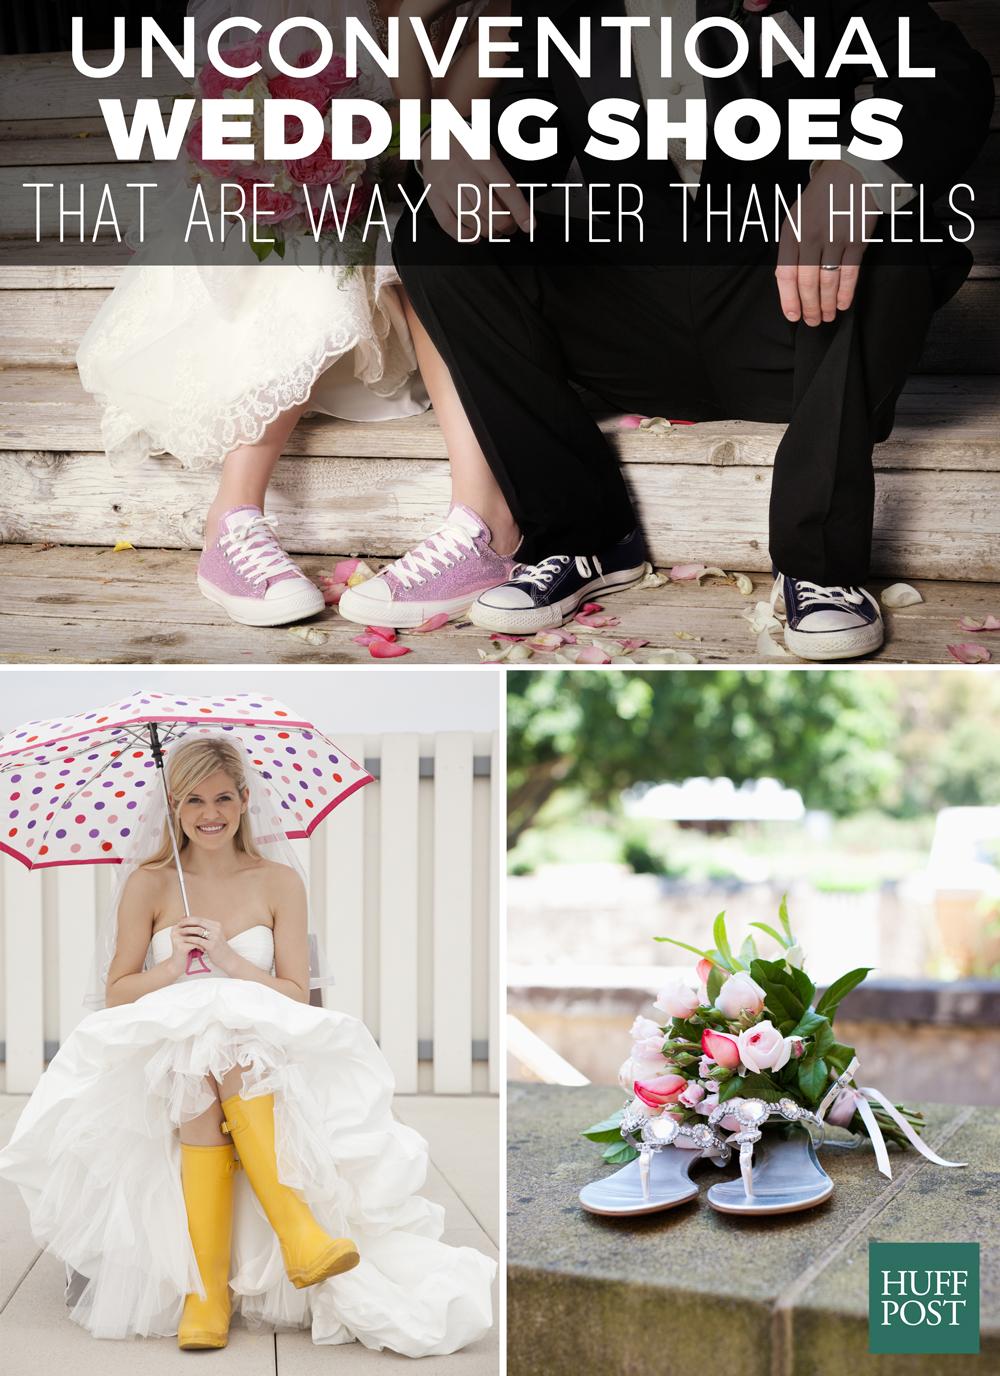 2015-06-12-1434129522-4481408-brideunconventionalshoes61215.jpg